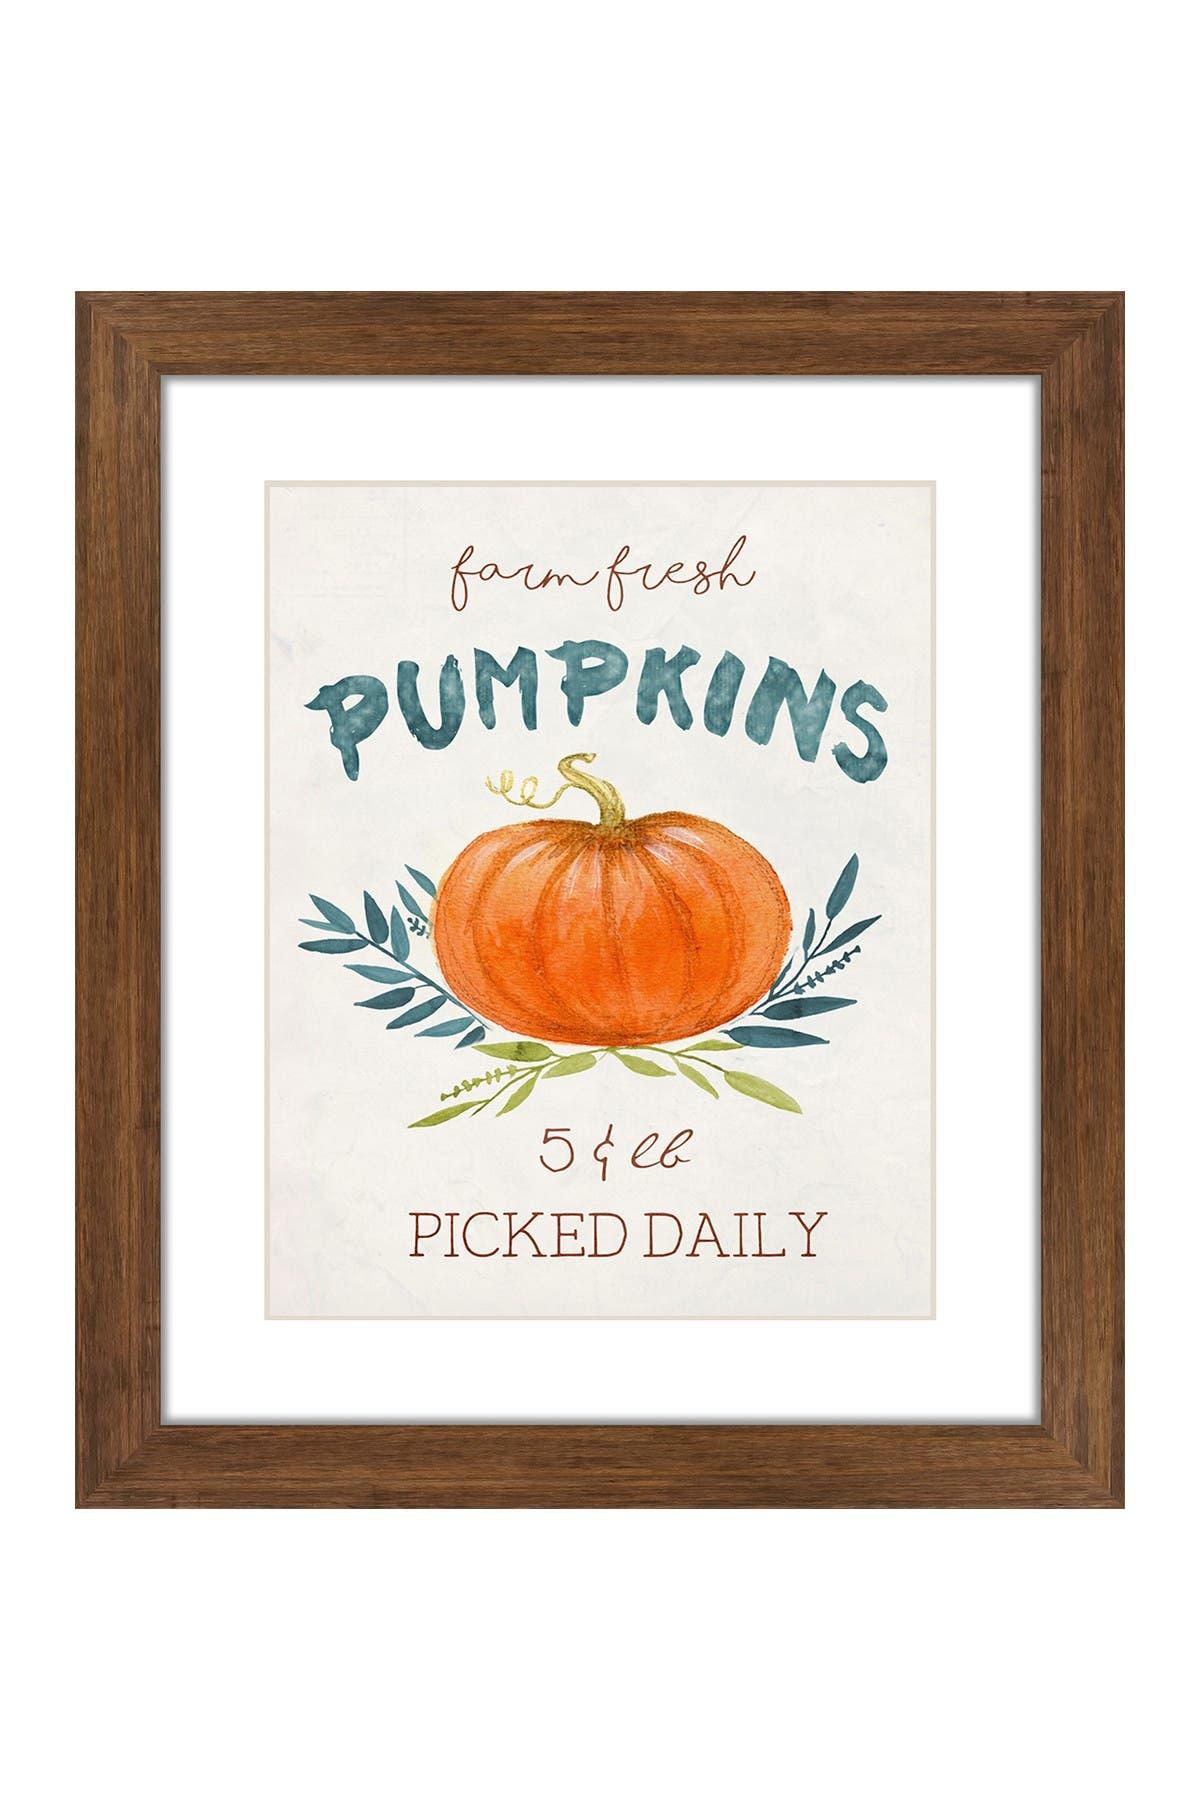 Image of PTM Images Fresh Pumpkins Rustic Wood Framed Matted Giclee Print